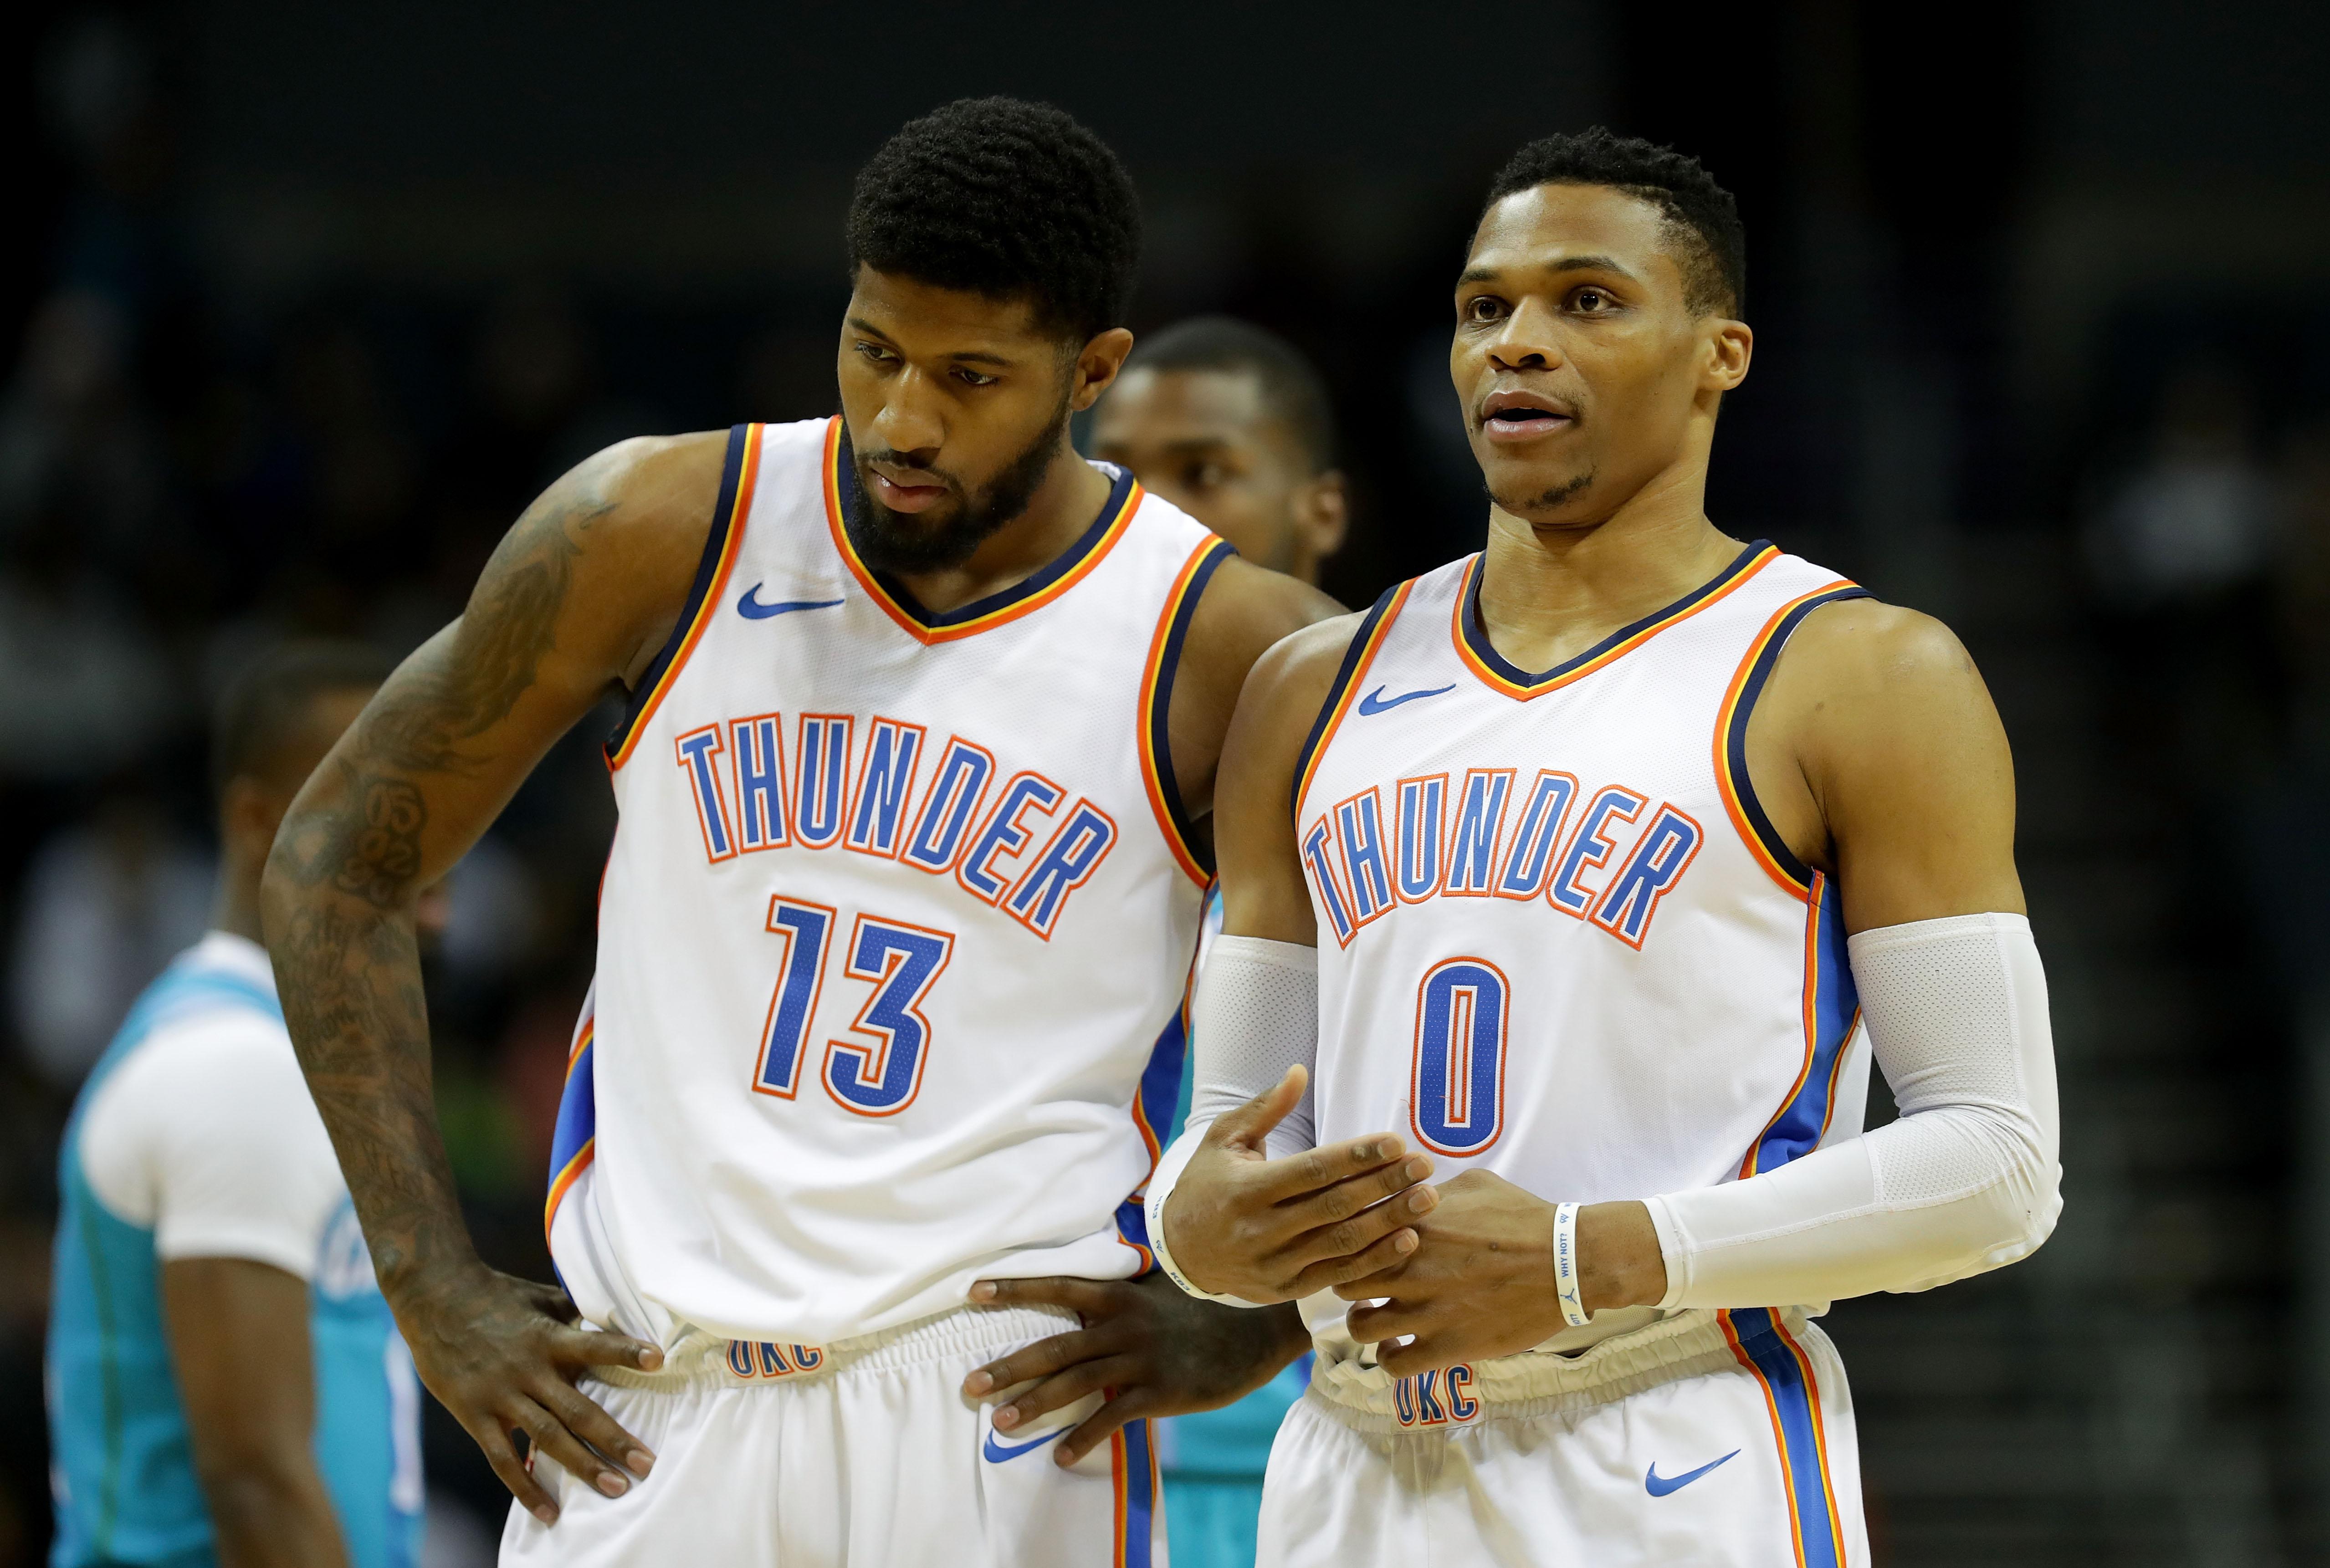 OKC Thunder: The Russell Westbrook good/bad teammate debate